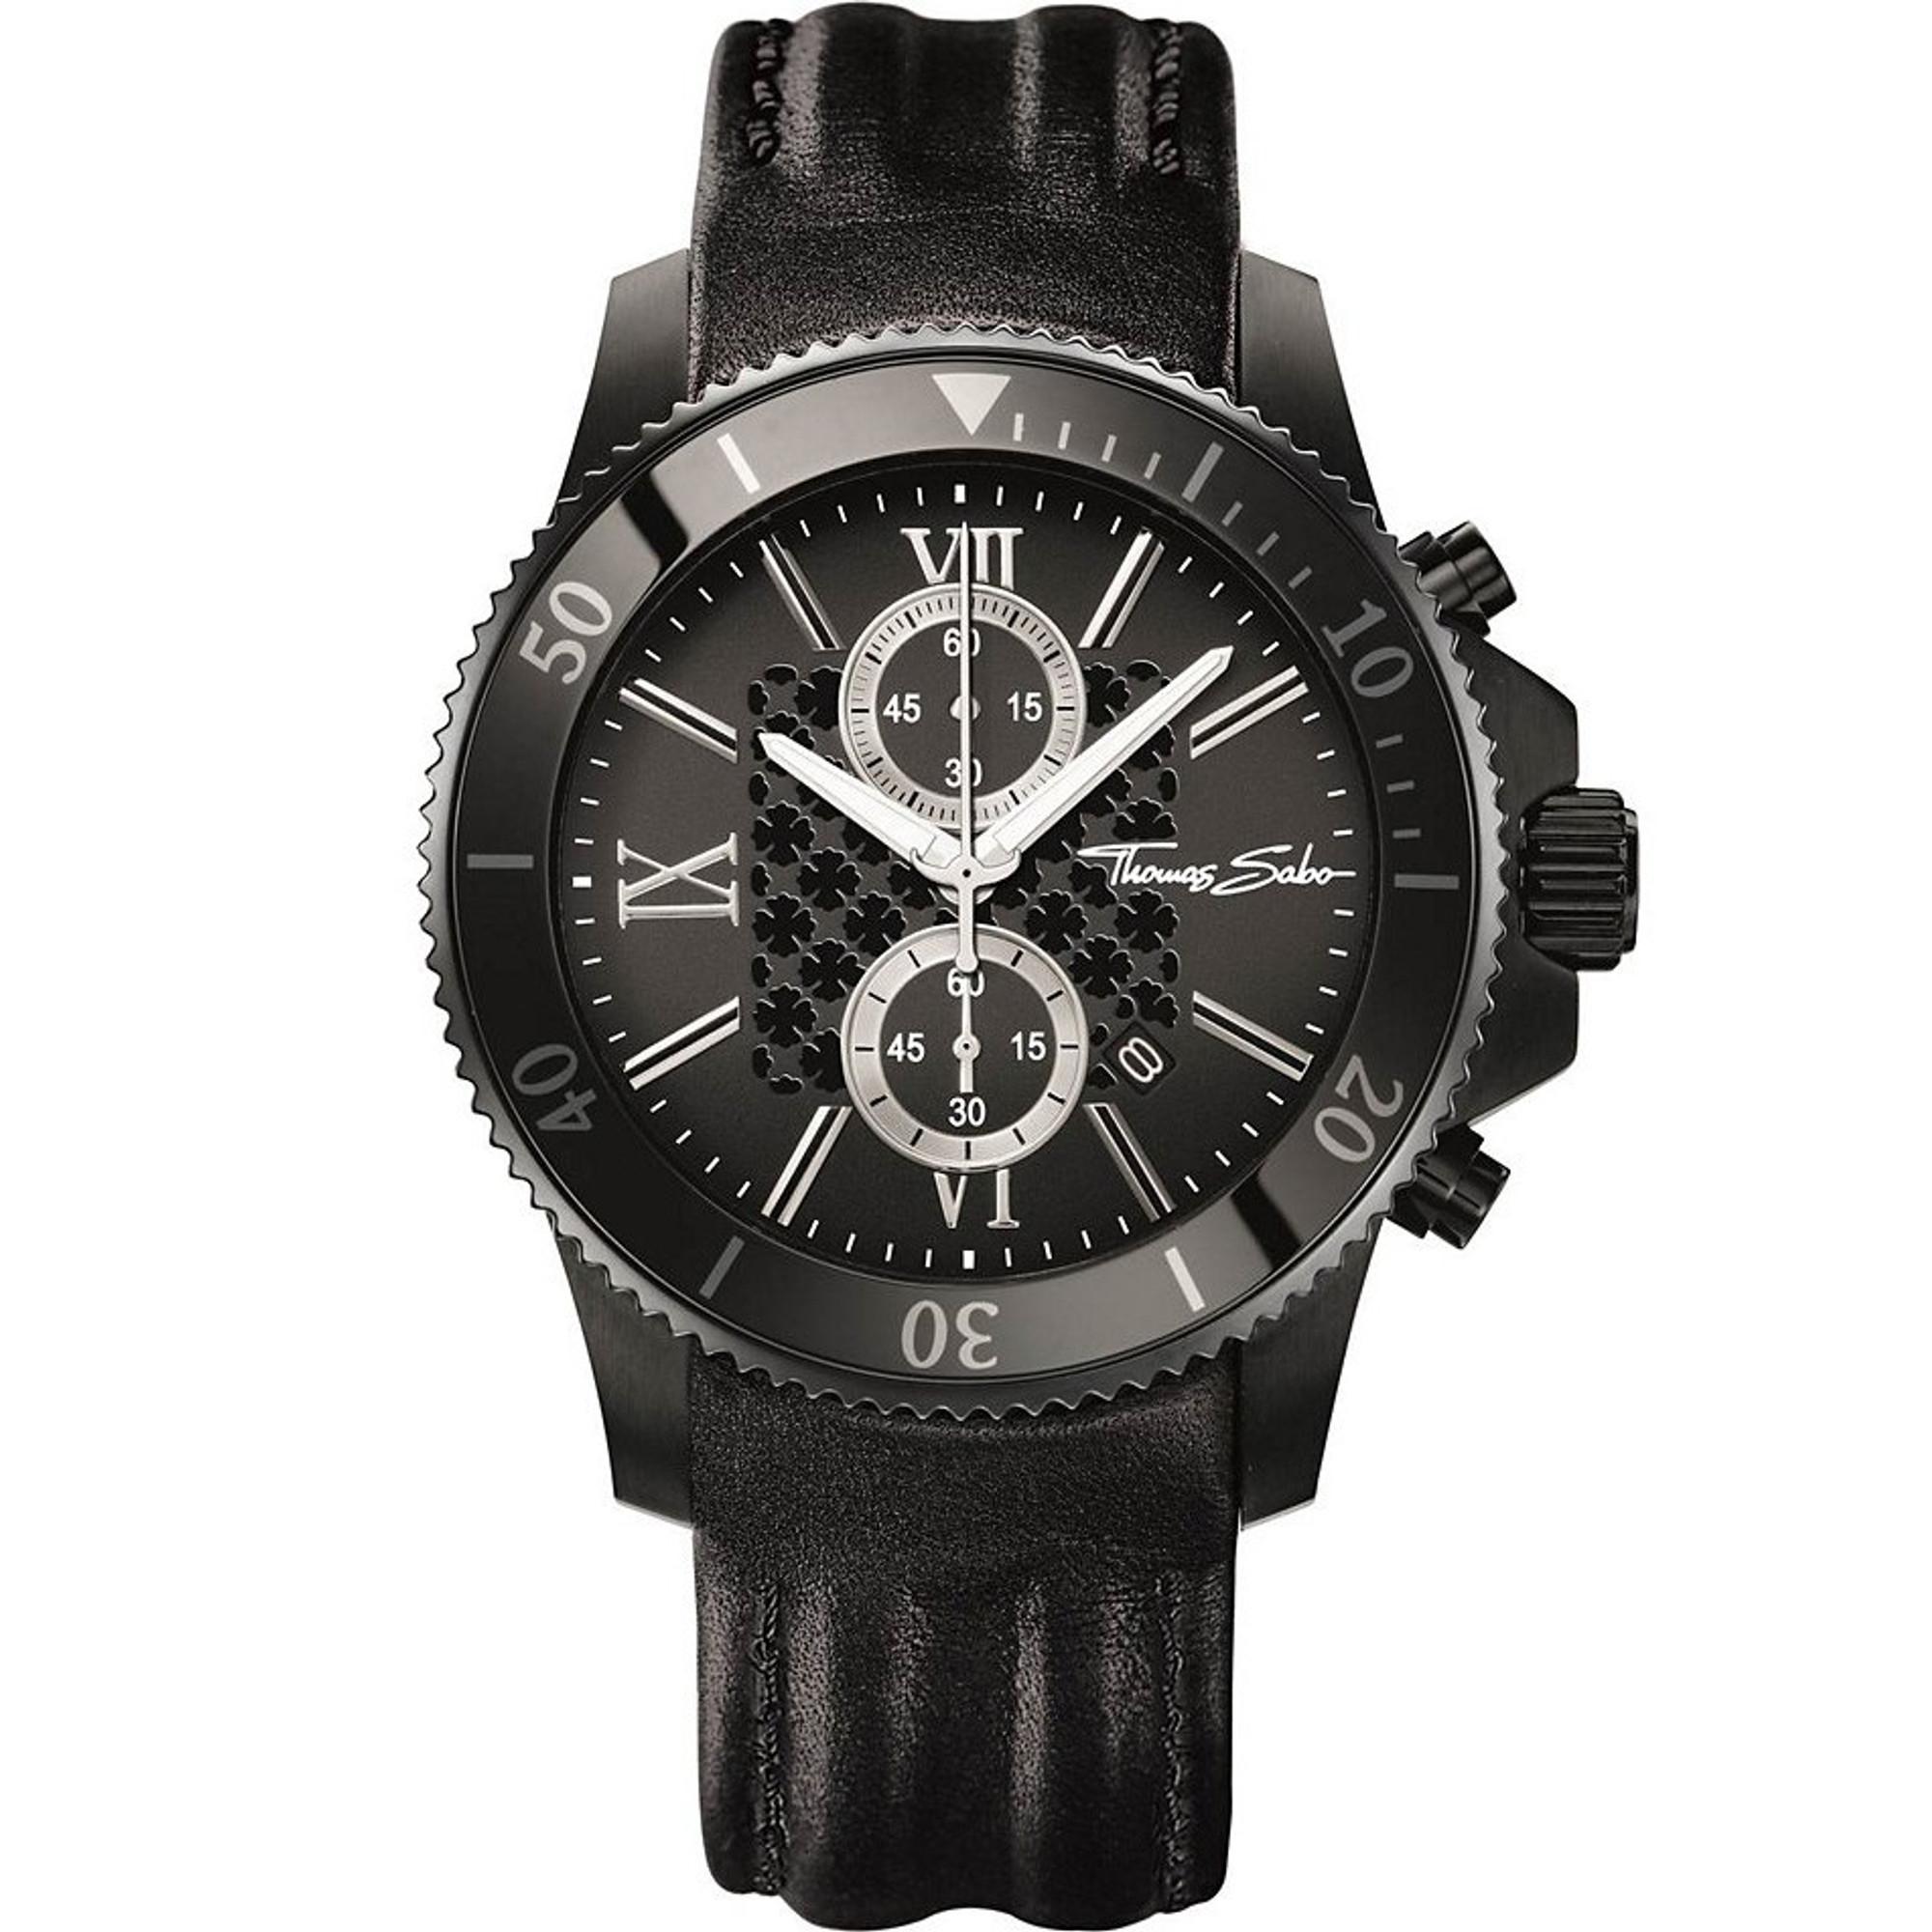 THOMAS SABO Rebel Race Chronograph WA0200